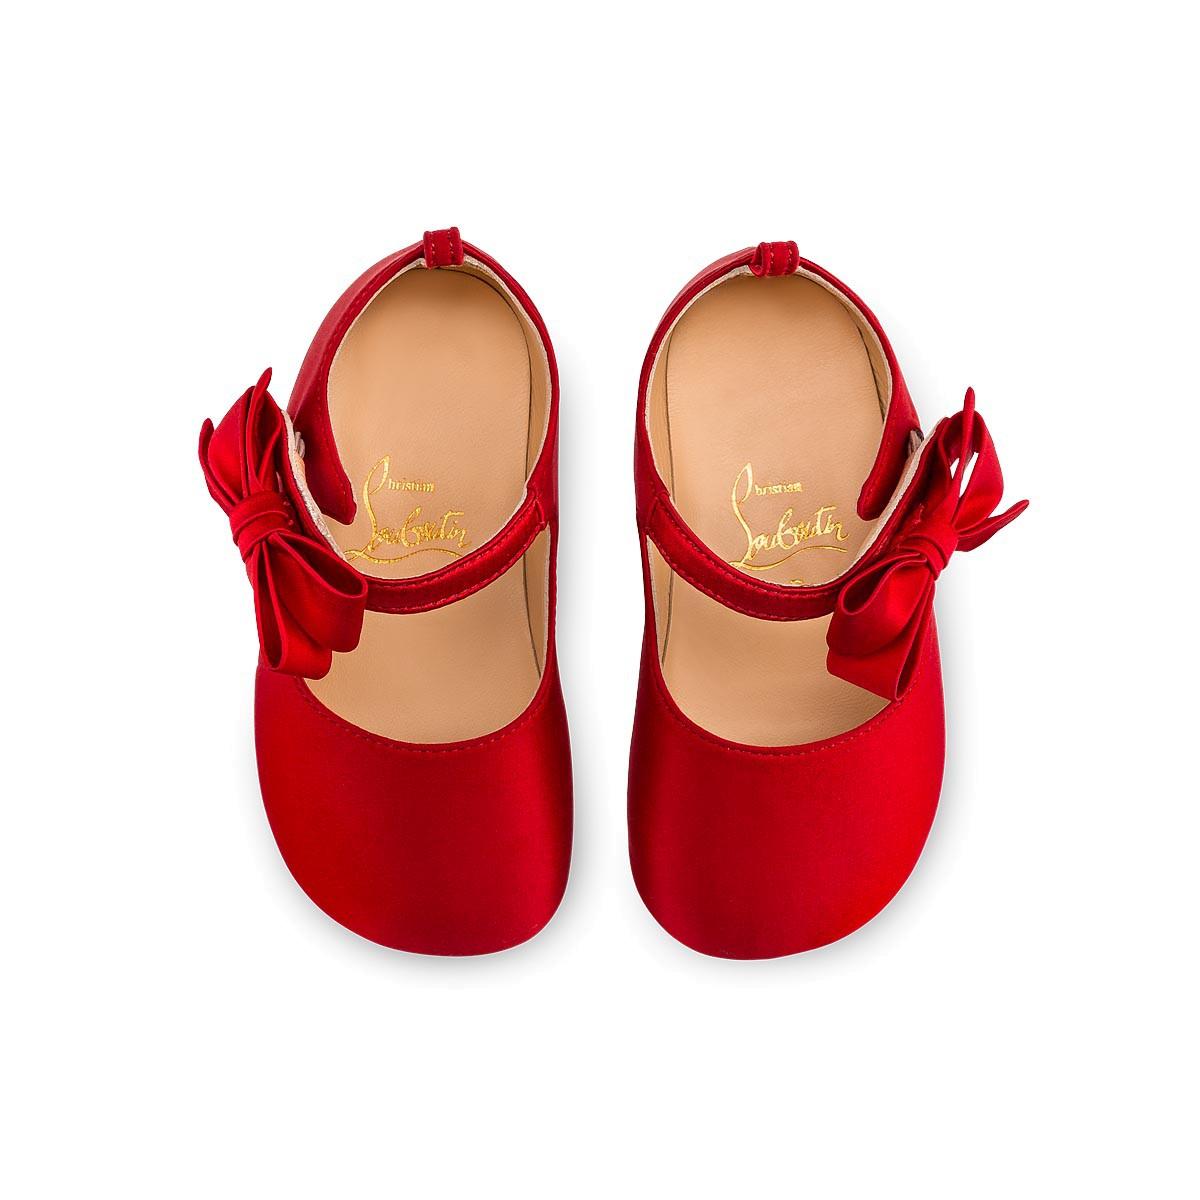 8676010ce8b Loubi Red Baby Shoes LOUBI Crepe satin Satin Lurex - Women Shoes ...